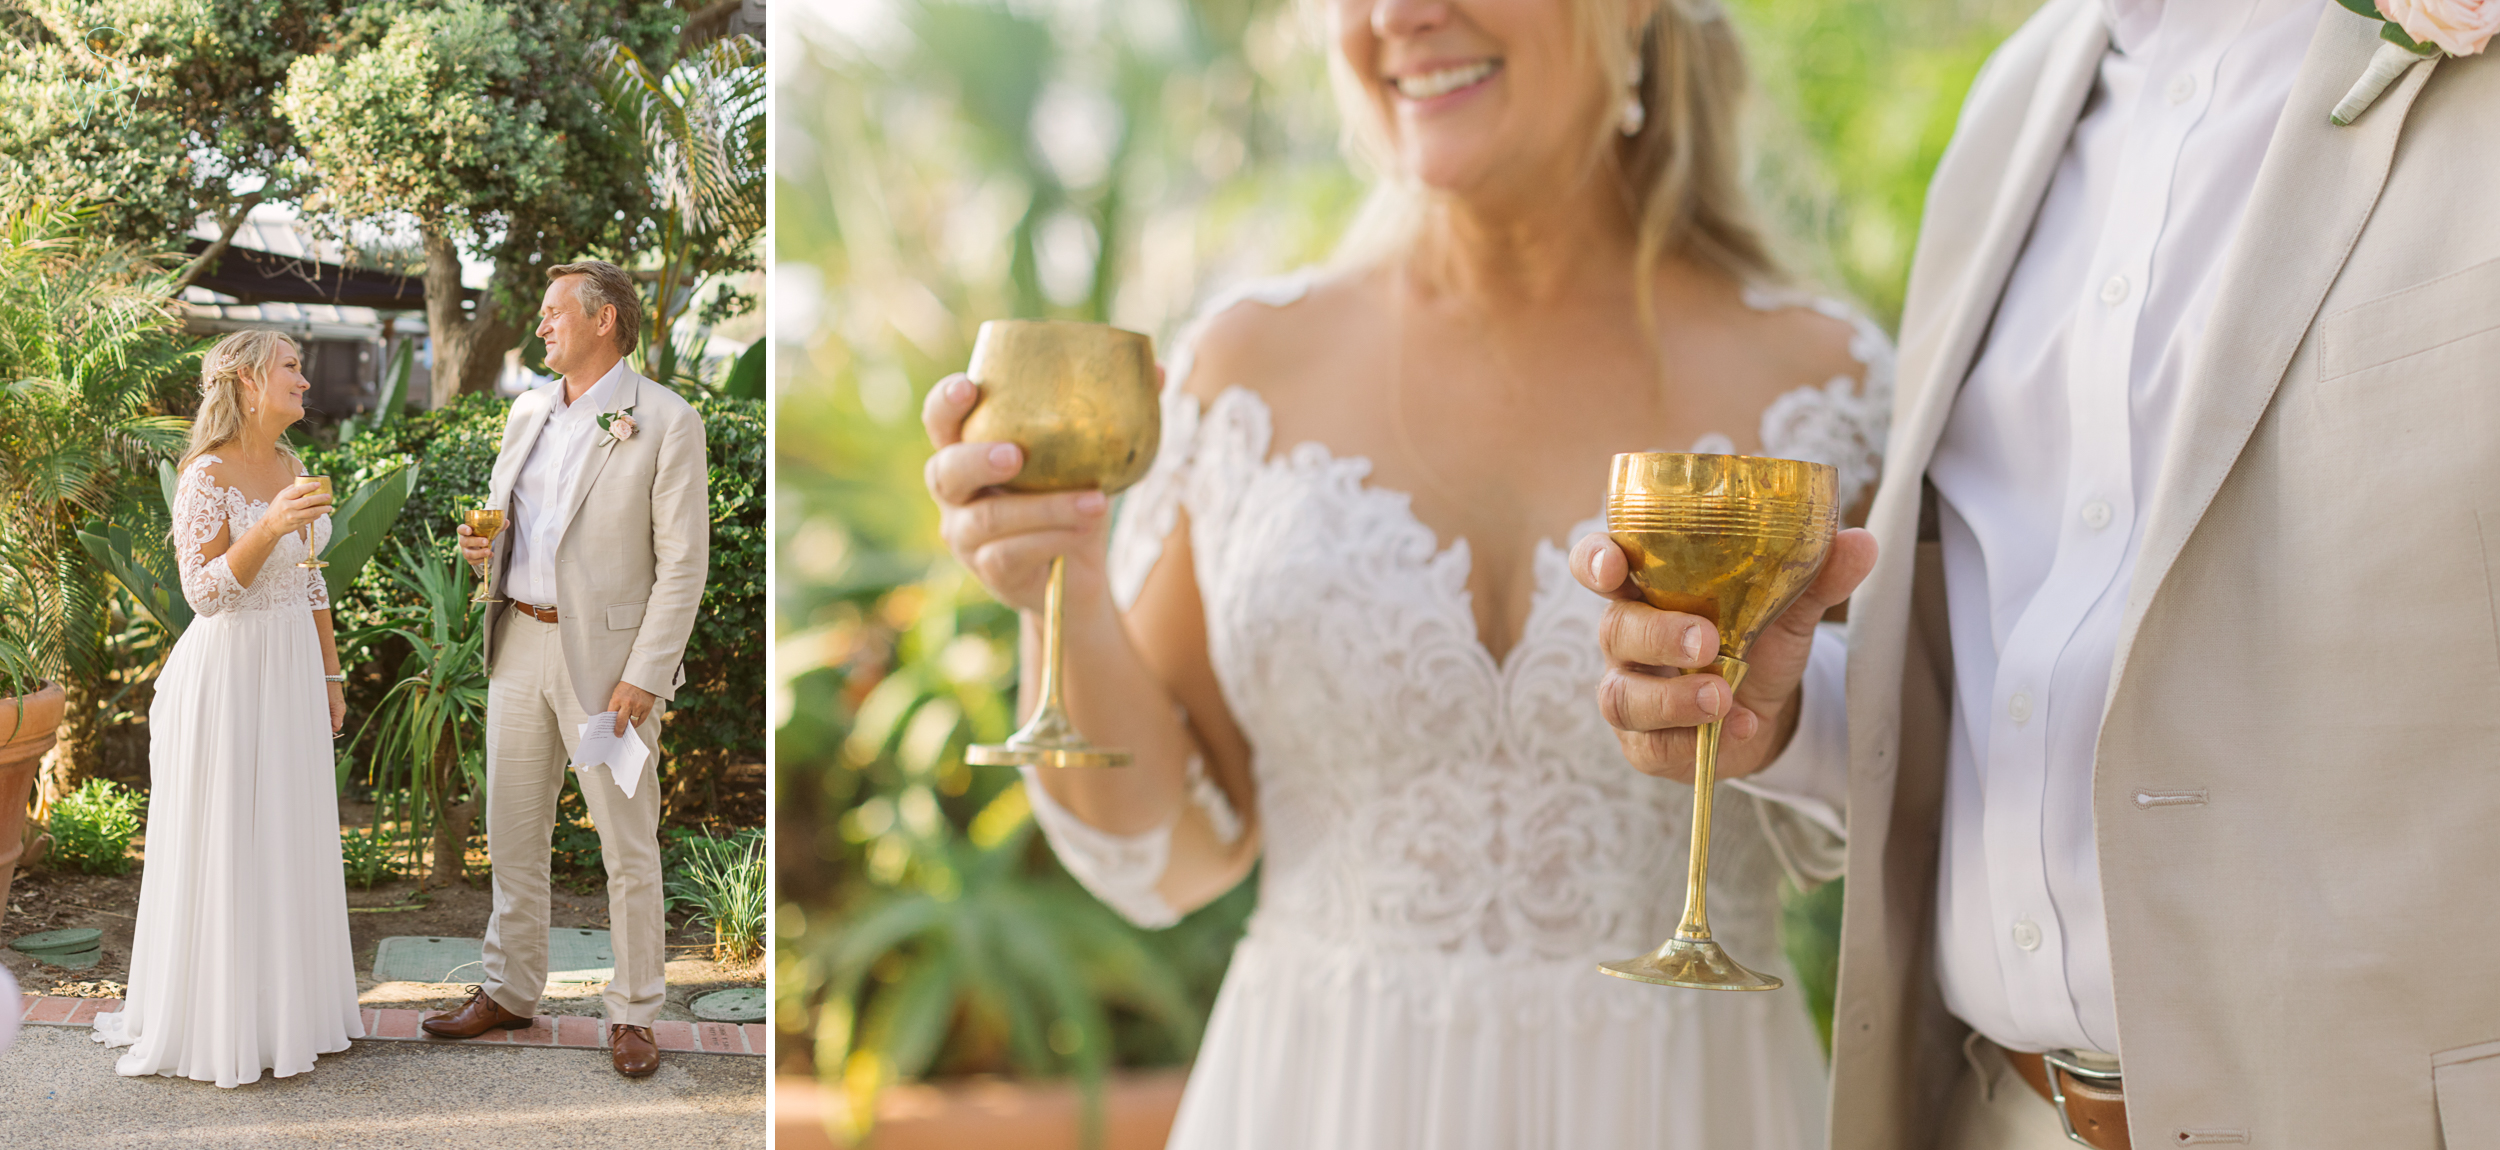 146DEL.MAR.WEDDINGS.photography.shewanders.JPG